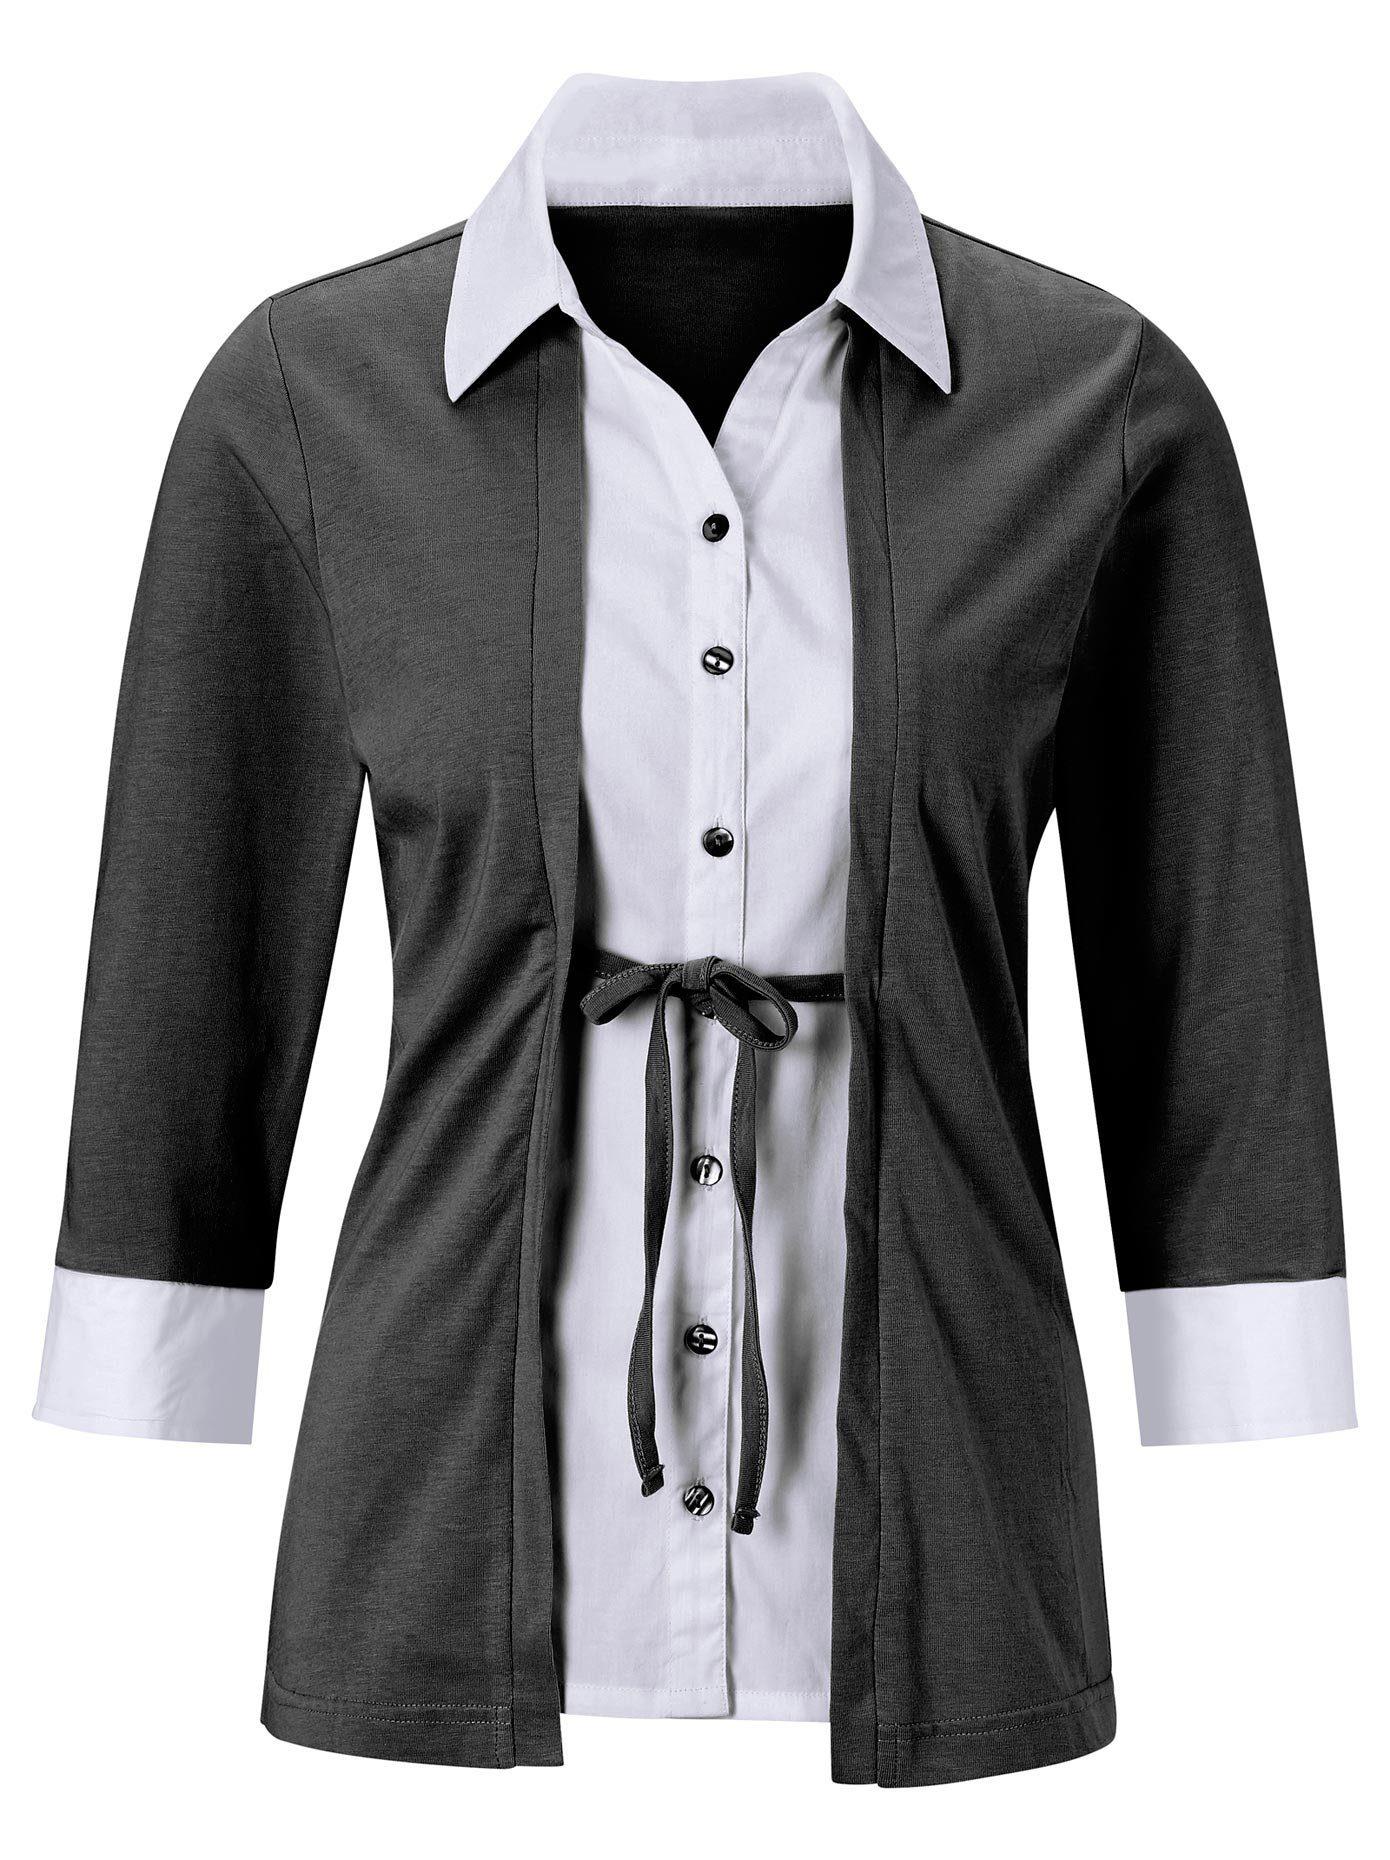 Casual Looks 2-in-1-Shirt online kaufen TPhiua N1Y0OD